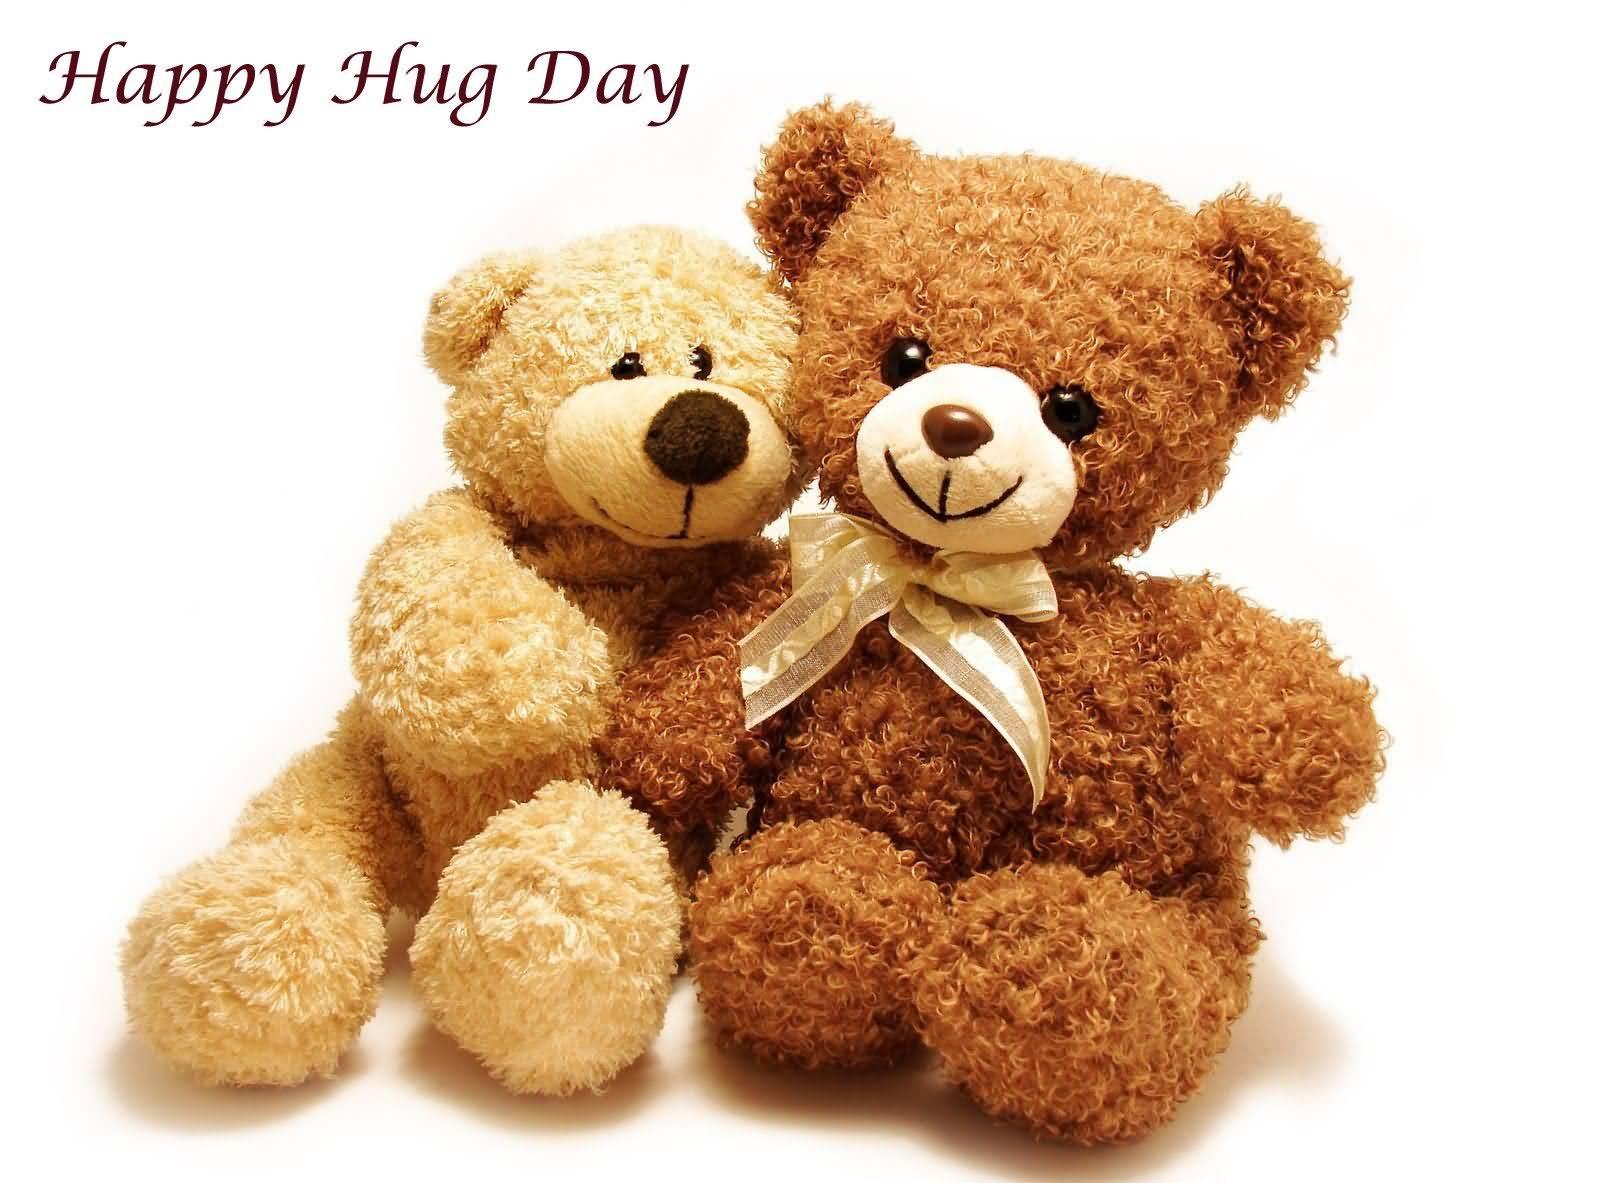 Hug Day Teddy Pics Twitter thumbnail